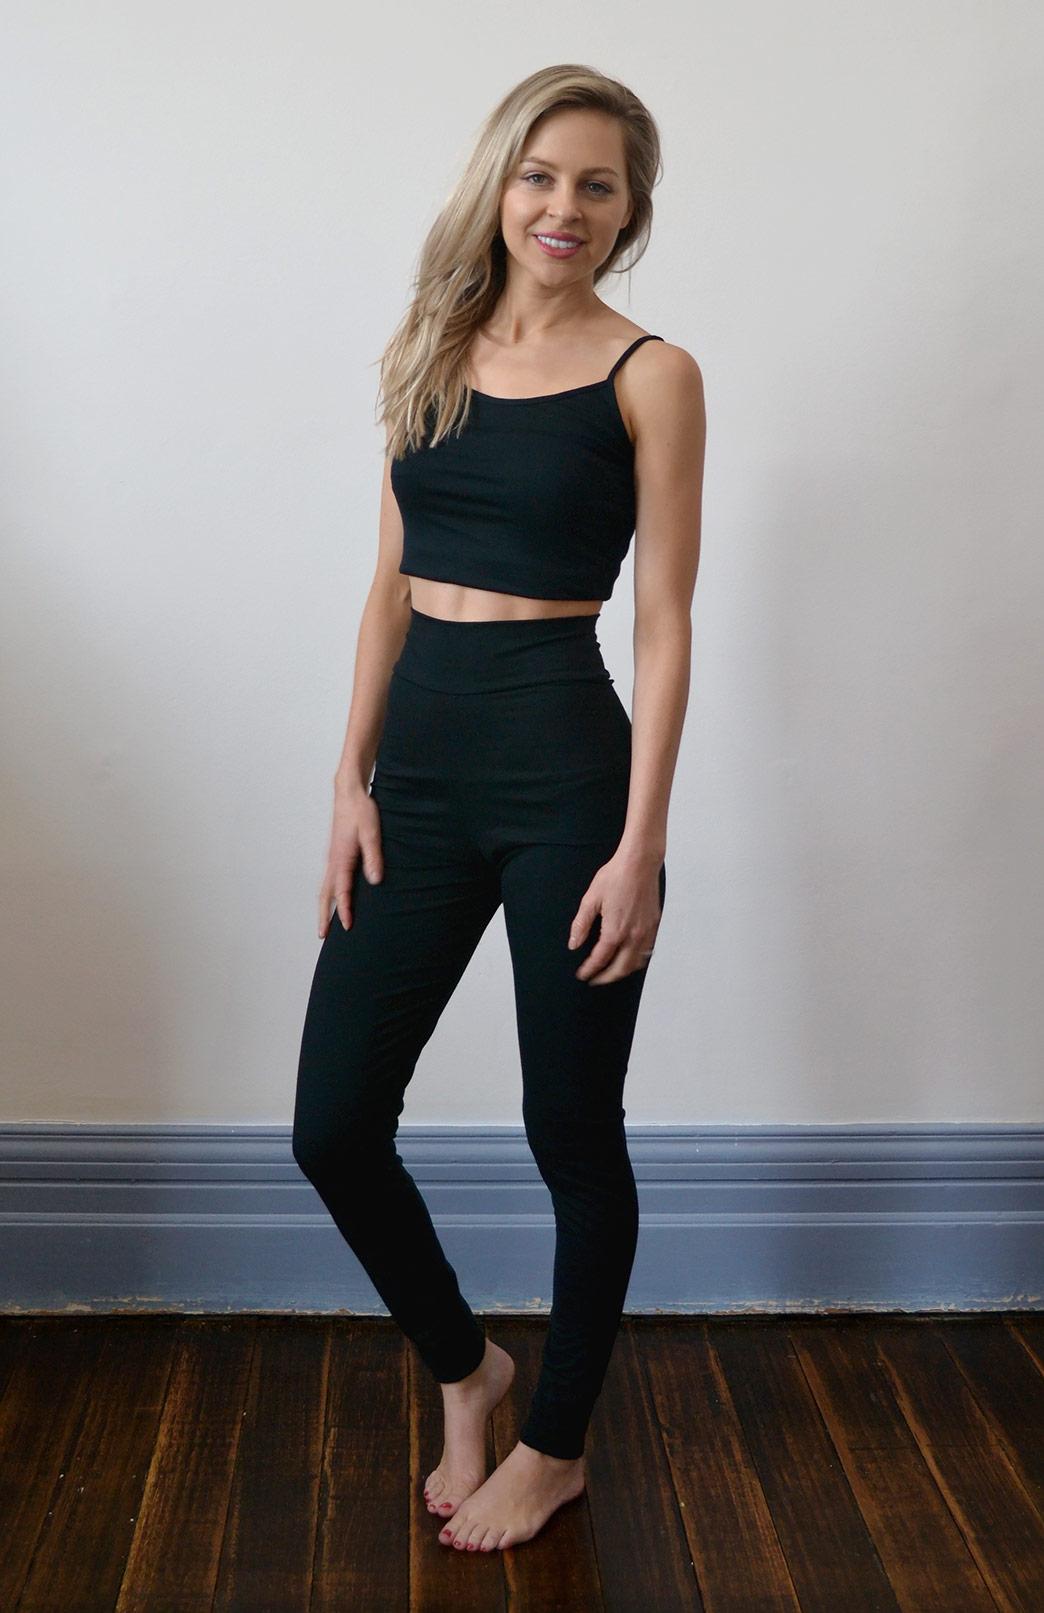 High Waisted Leggings - Women's Black Wool High Waisted Leggings with no pockets or fastenings 200gsm - Smitten Merino Tasmania Australia